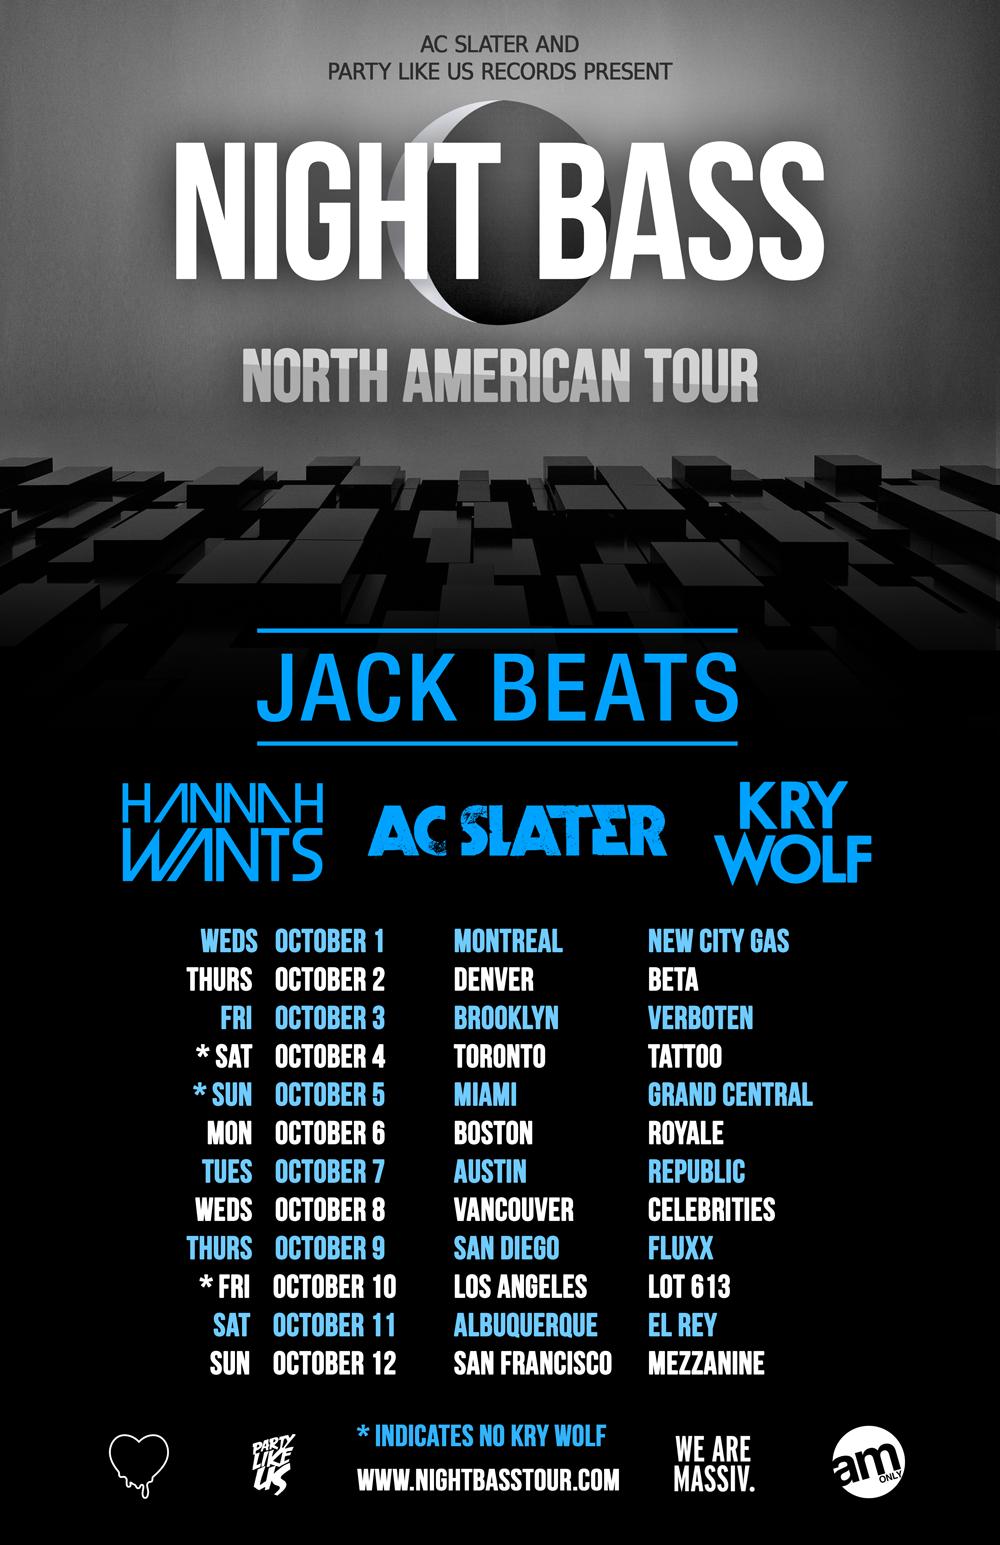 Jack Beats, AC Slater, Hannah Wants, Kry Wolf